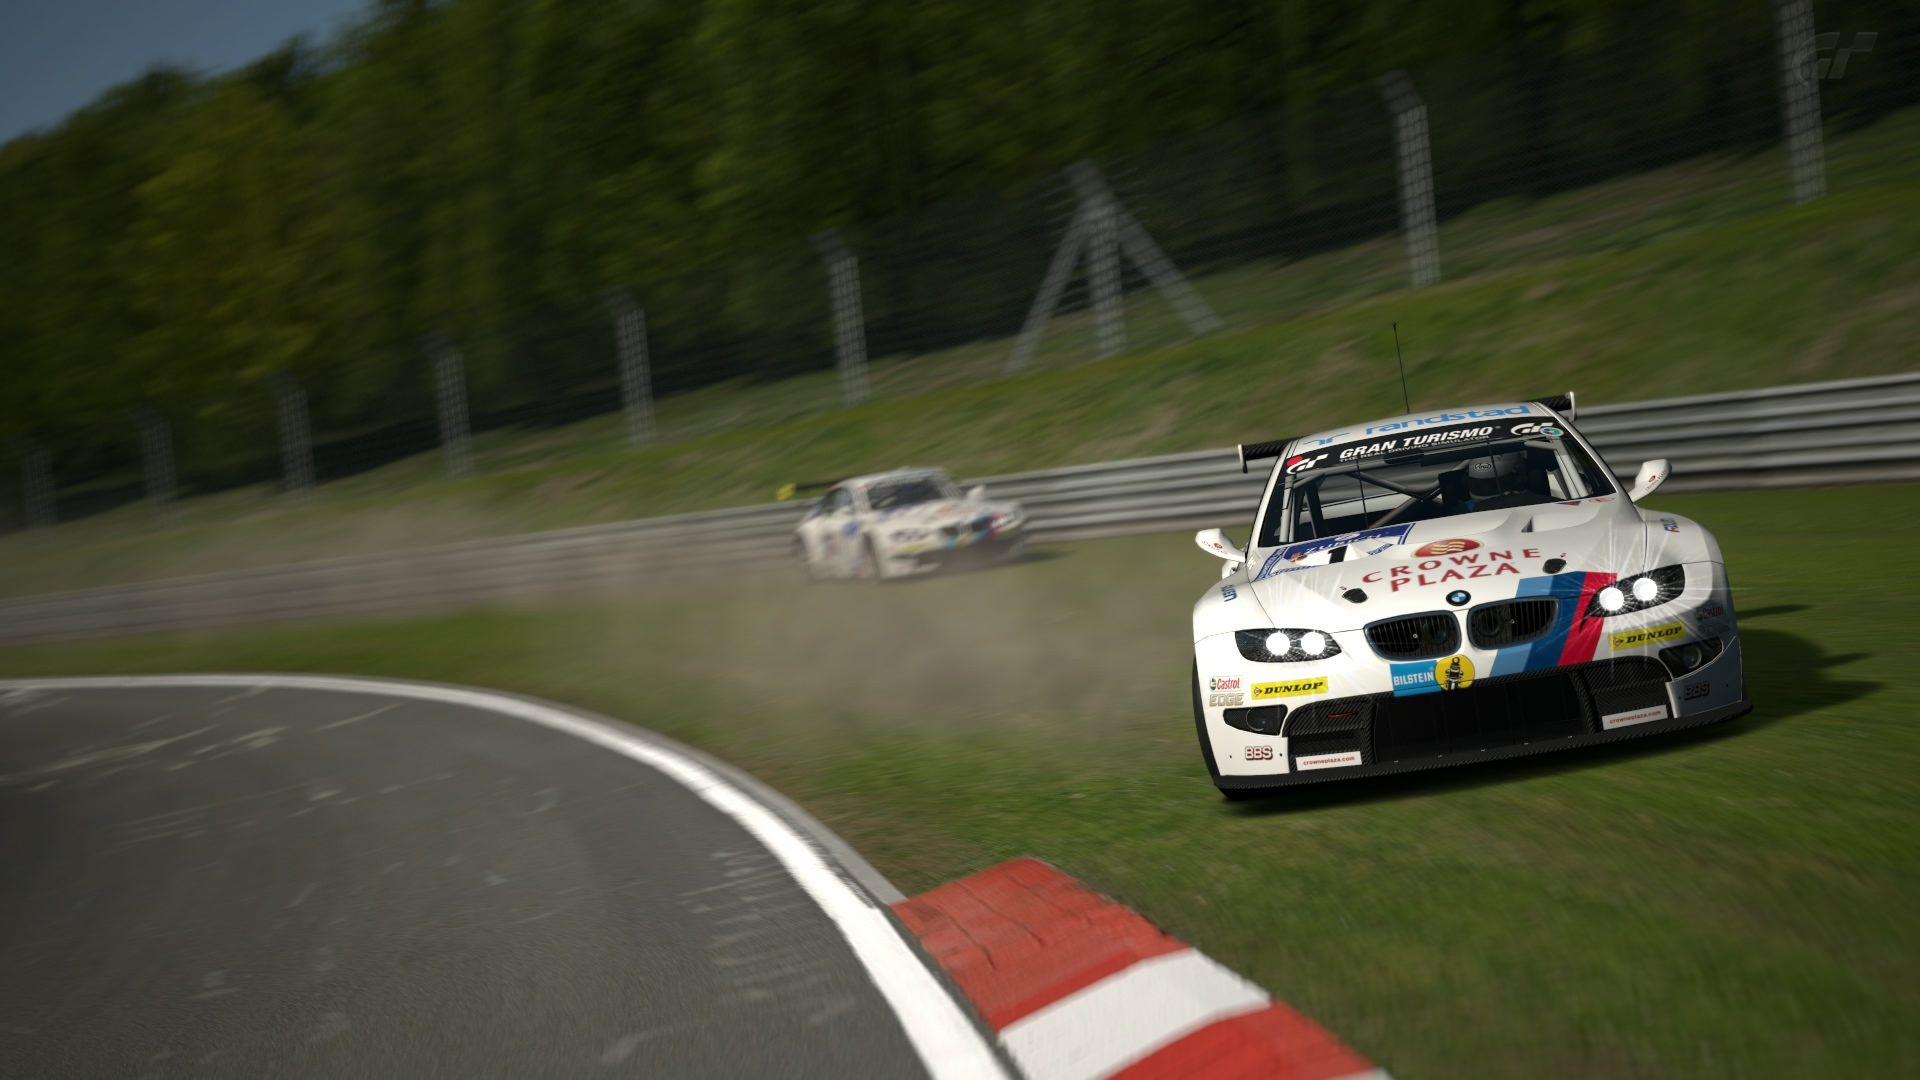 Nürburgring Nordschleife_52.jpg